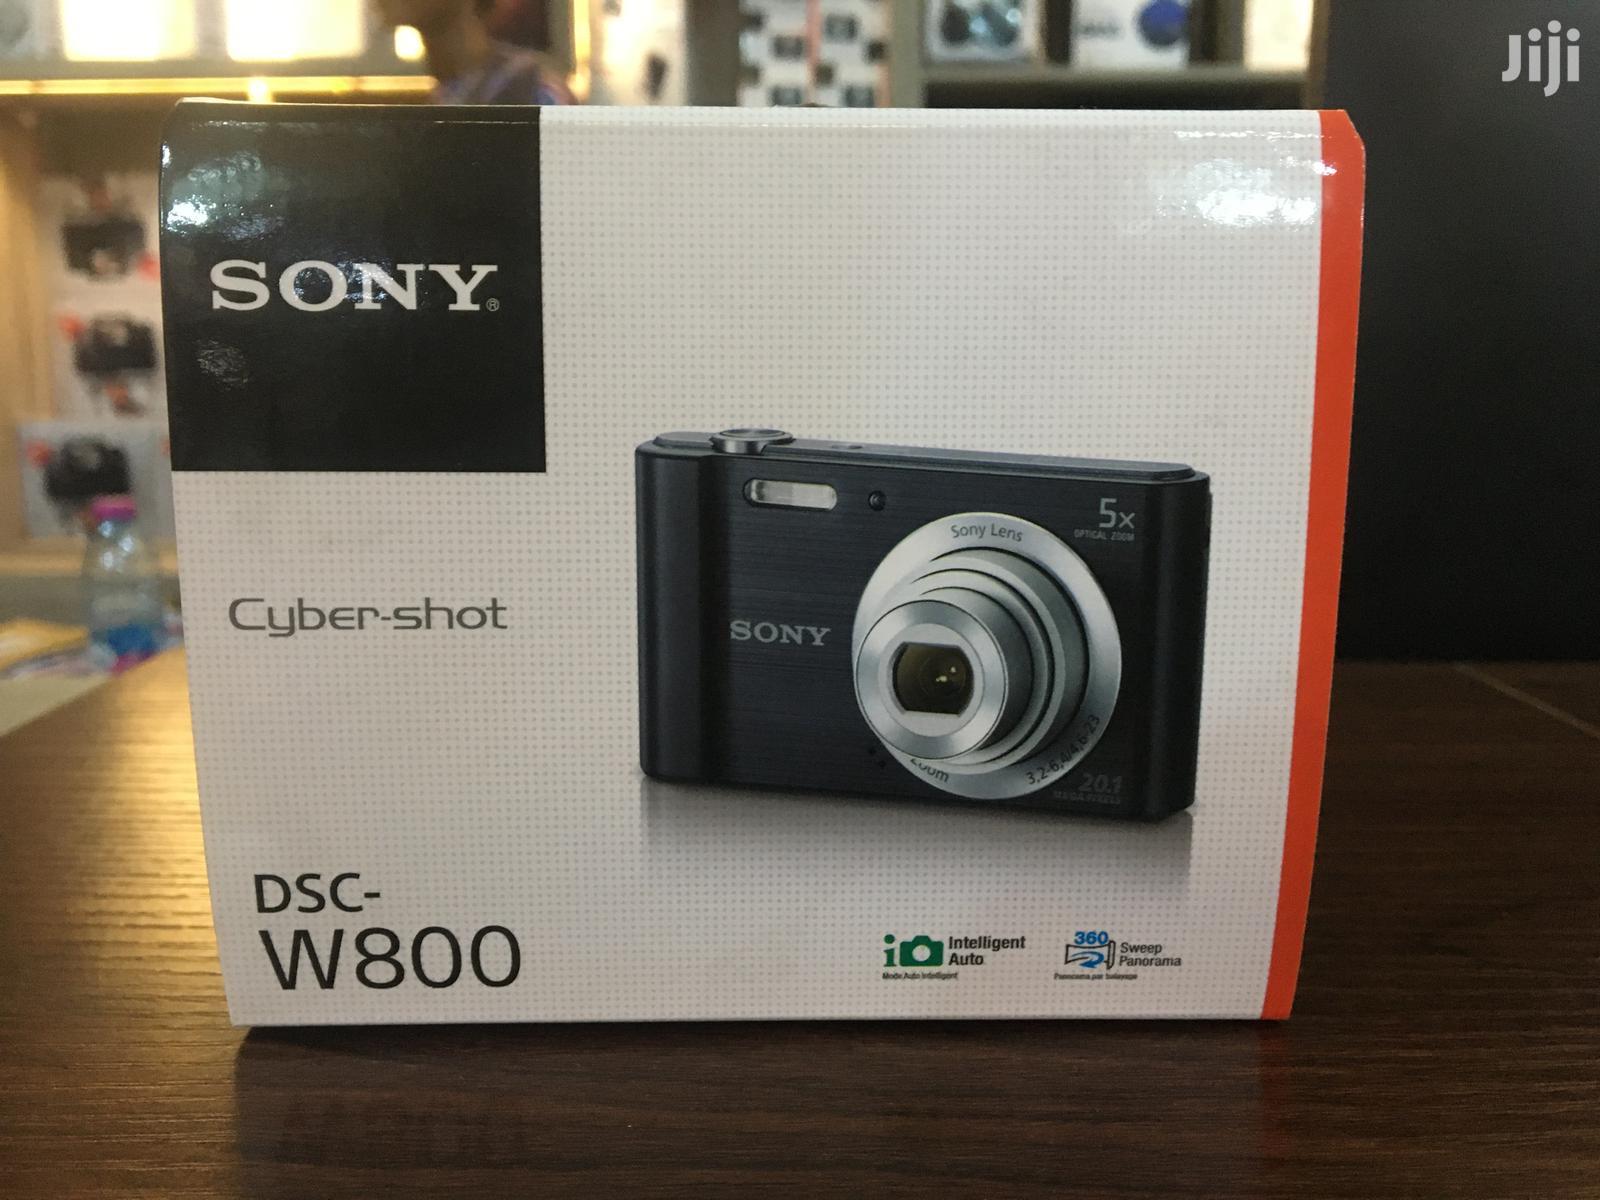 Sony Cyber-shot Digital Camera Black (DSC-W800)